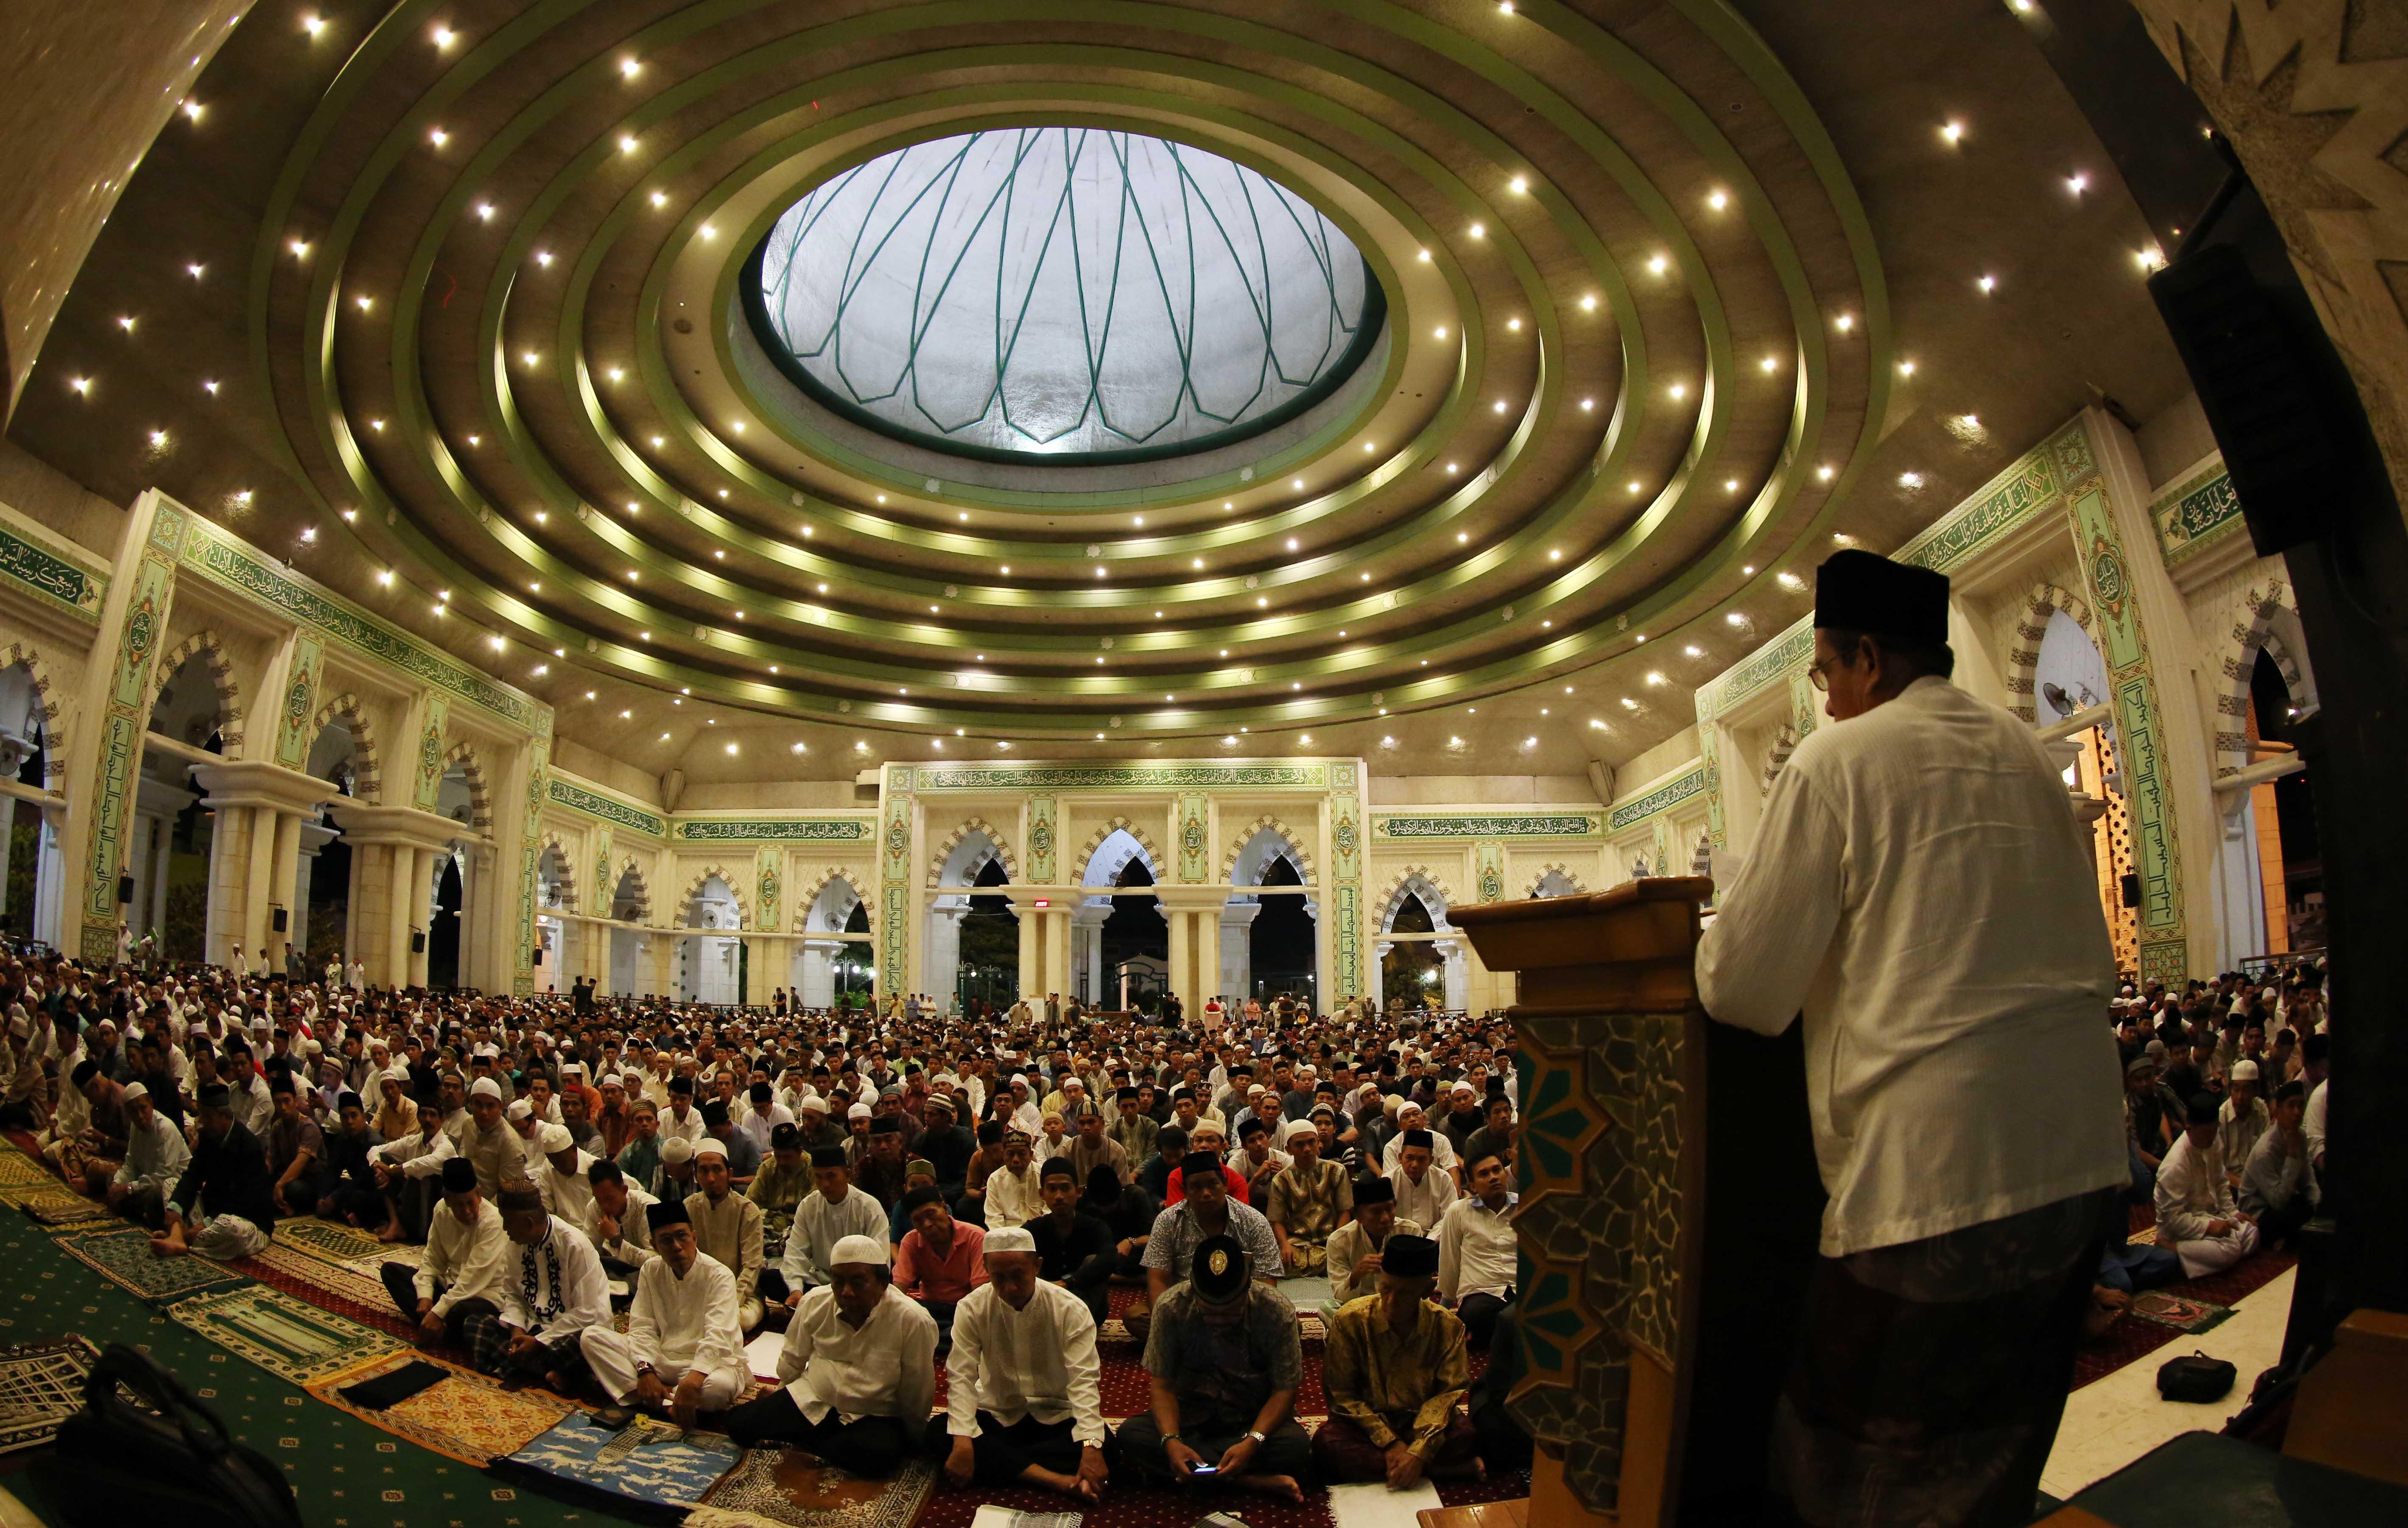 Makassar Merdeka Foto Tarawih Kemegahan Masjid Raya Kota